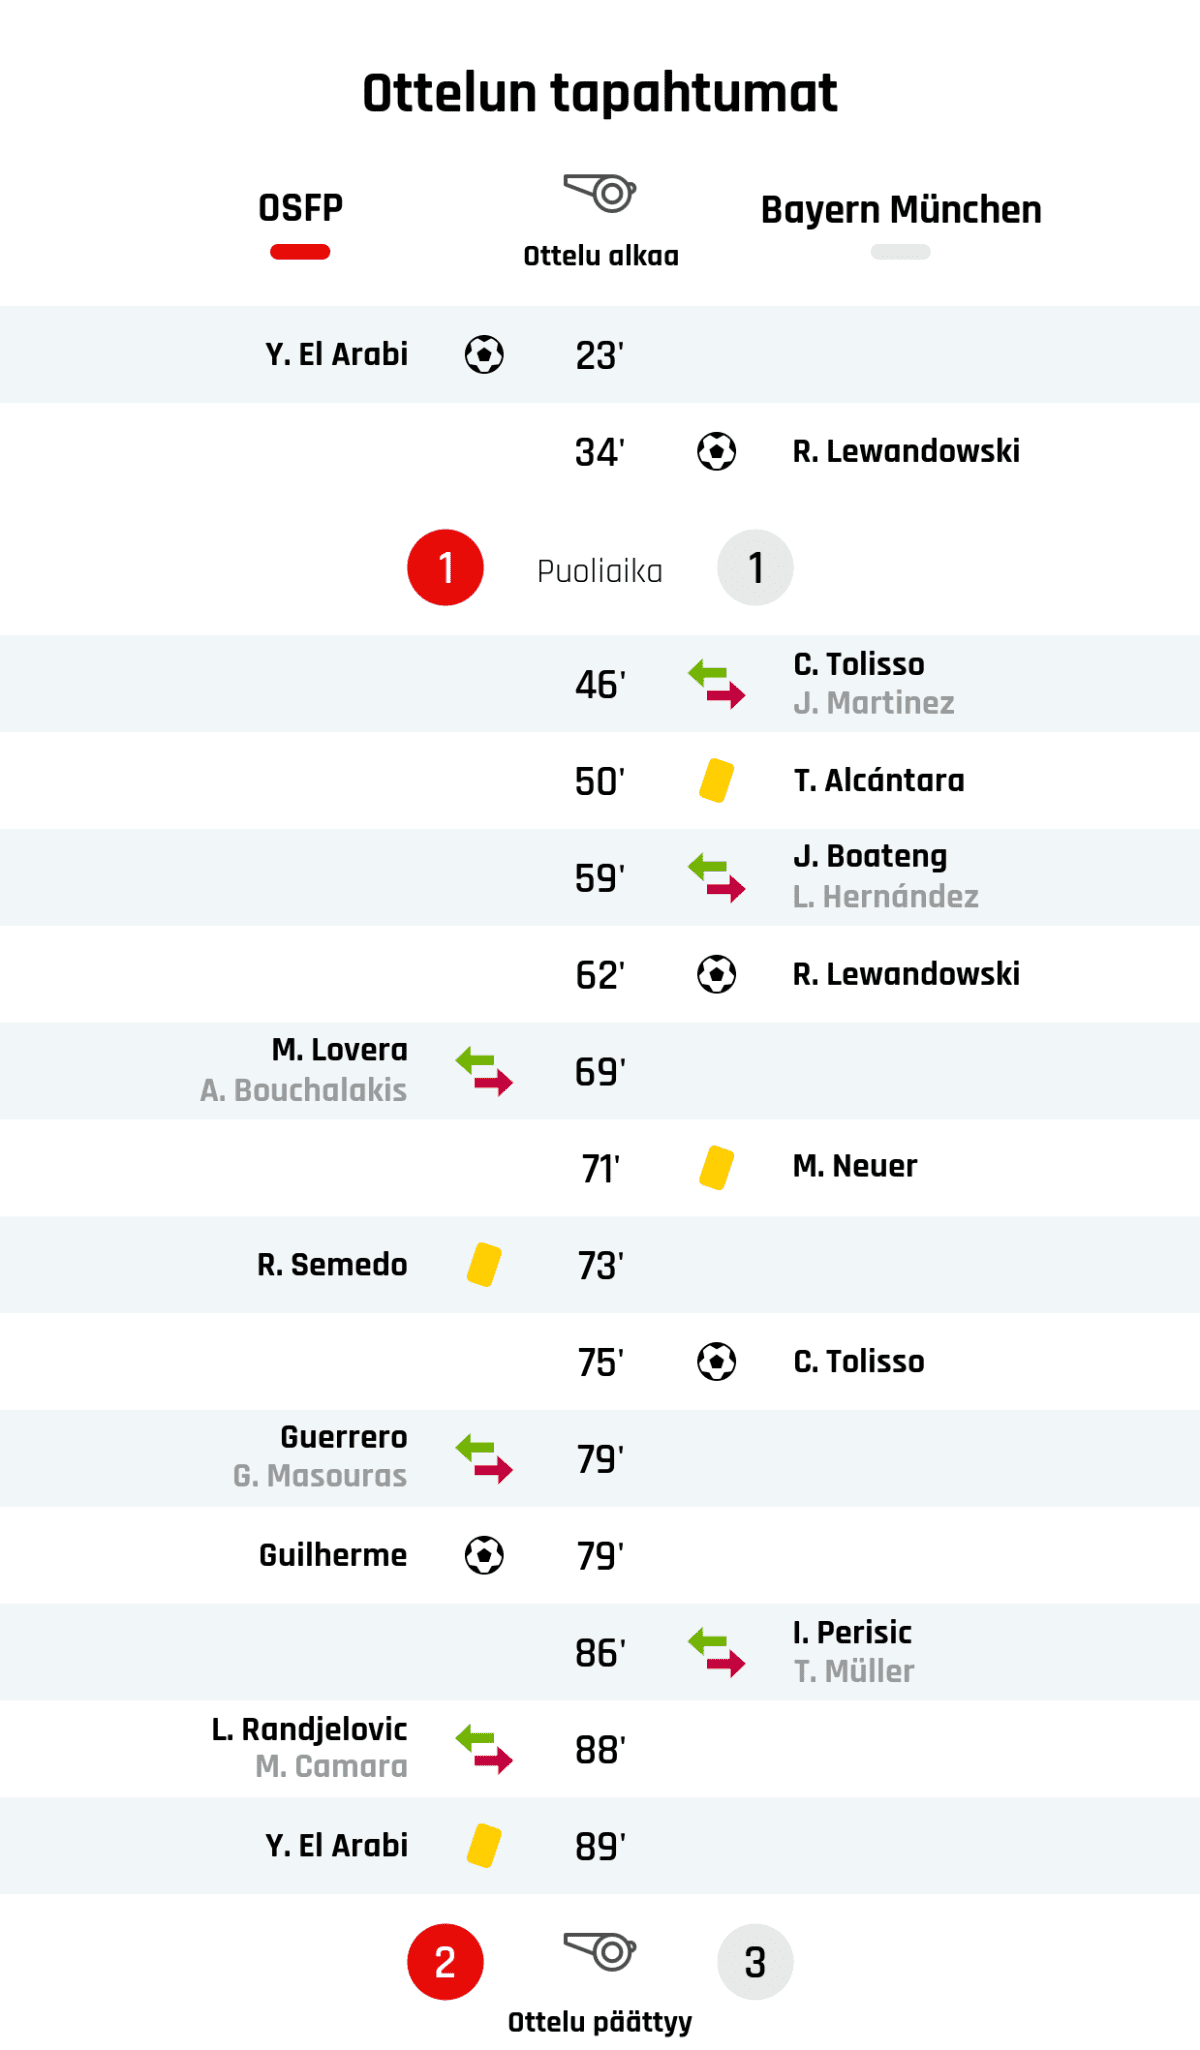 23' Maali Olympiakosille: Y. El Arabi 34' Maali Bayern Münchenille: R. Lewandowski Puoliajan tulos: Olympiakos 1, Bayern München 1 46' Bayern Münchenin vaihto: sisään C. Tolisso, ulos J. Martinez 50' Keltainen kortti: T. Alcántara, Bayern München 59' Bayern Münchenin vaihto: sisään J. Boateng, ulos L. Hernández 62' Maali Bayern Münchenille: R. Lewandowski 69' Olympiakosin vaihto: sisään M. Lovera, ulos A. Bouchalakis 71' Keltainen kortti: M. Neuer, Bayern München 73' Keltainen kortti: R. Semedo, Olympiakos 75' Maali Bayern Münchenille: C. Tolisso 79' Olympiakosin vaihto: sisään Guerrero, ulos G. Masouras 79' Maali Olympiakosille: Guilherme 86' Bayern Münchenin vaihto: sisään I. Perisic, ulos T. Müller 88' Olympiakosin vaihto: sisään L. Randjelovic, ulos M. Camara 89' Keltainen kortti: Y. El Arabi, Olympiakos Lopputulos: Olympiakos 2, Bayern München 3